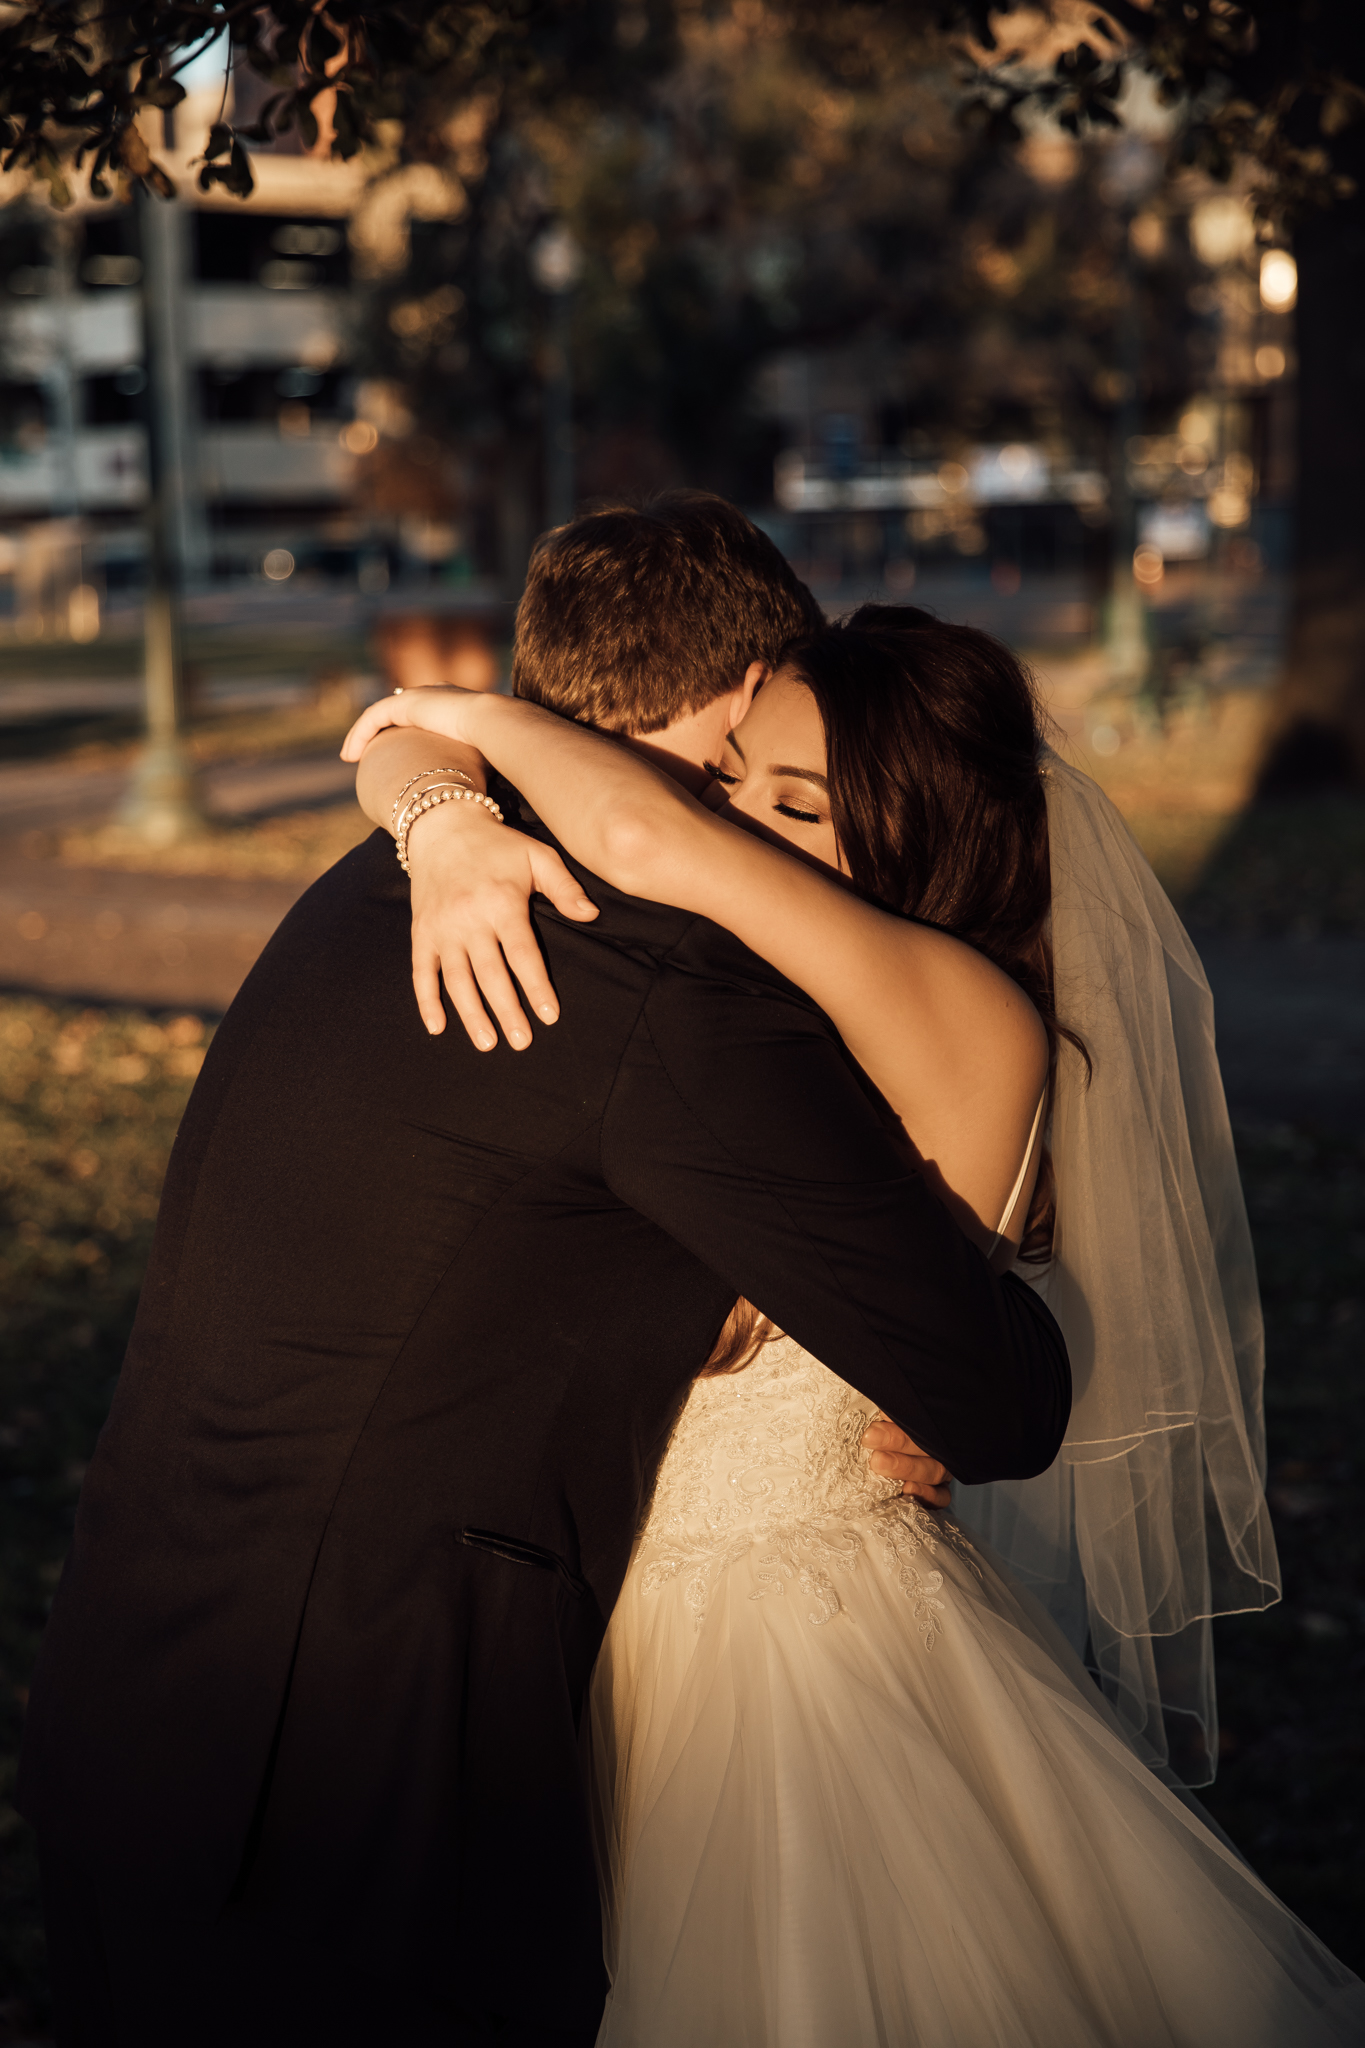 memphis-wedding-photographers-thewarmtharoundyou-ballinese-ballroom (70 of 232).jpg